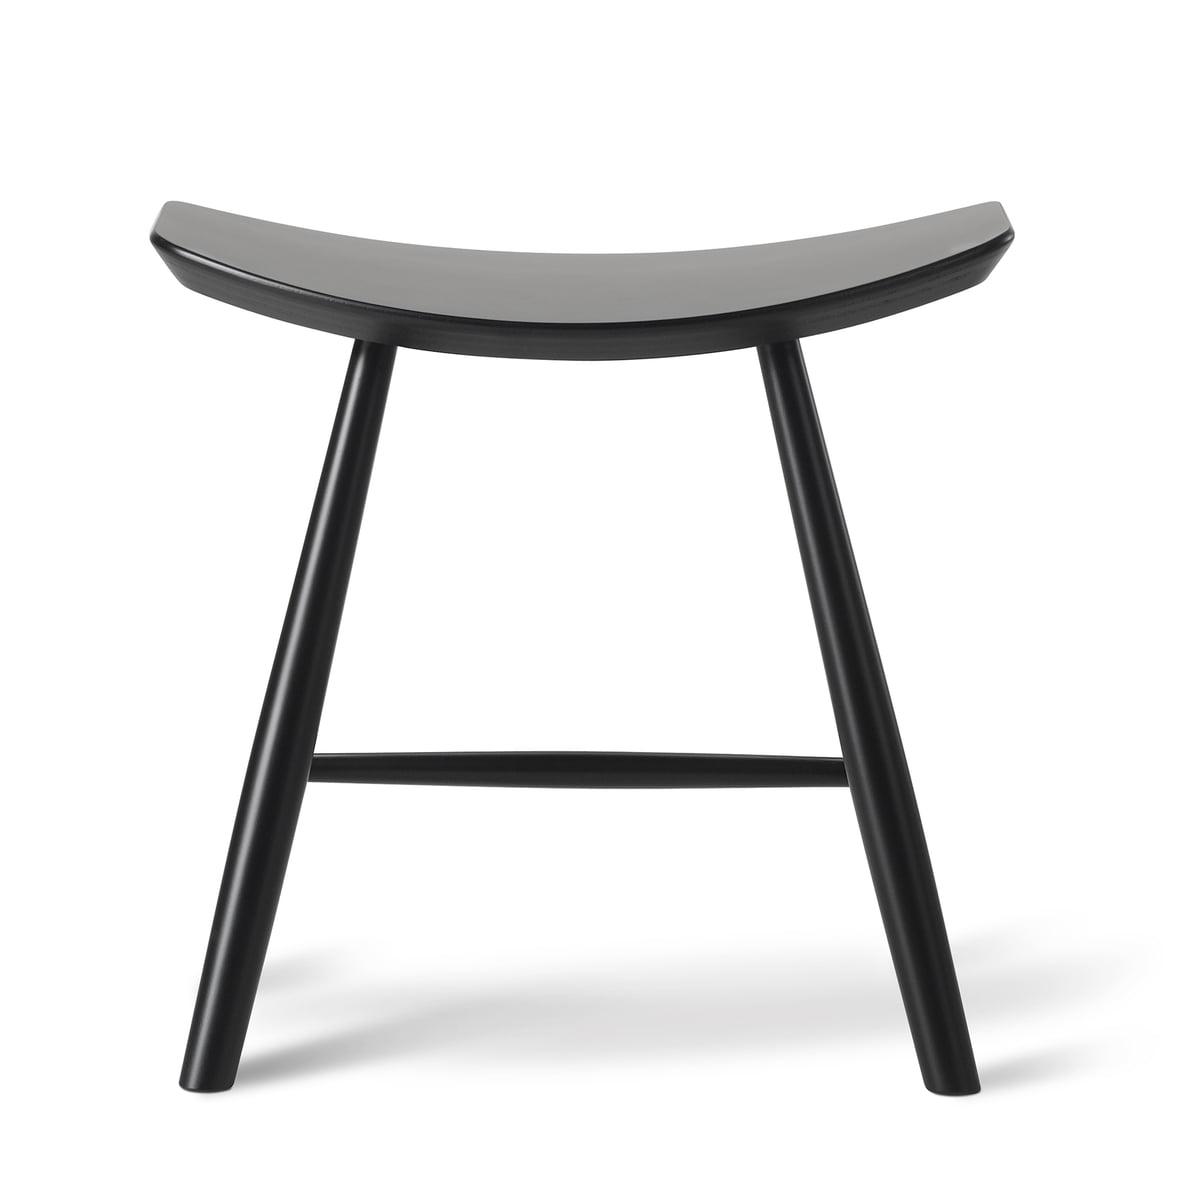 j63 hocker von fredericia im shop. Black Bedroom Furniture Sets. Home Design Ideas